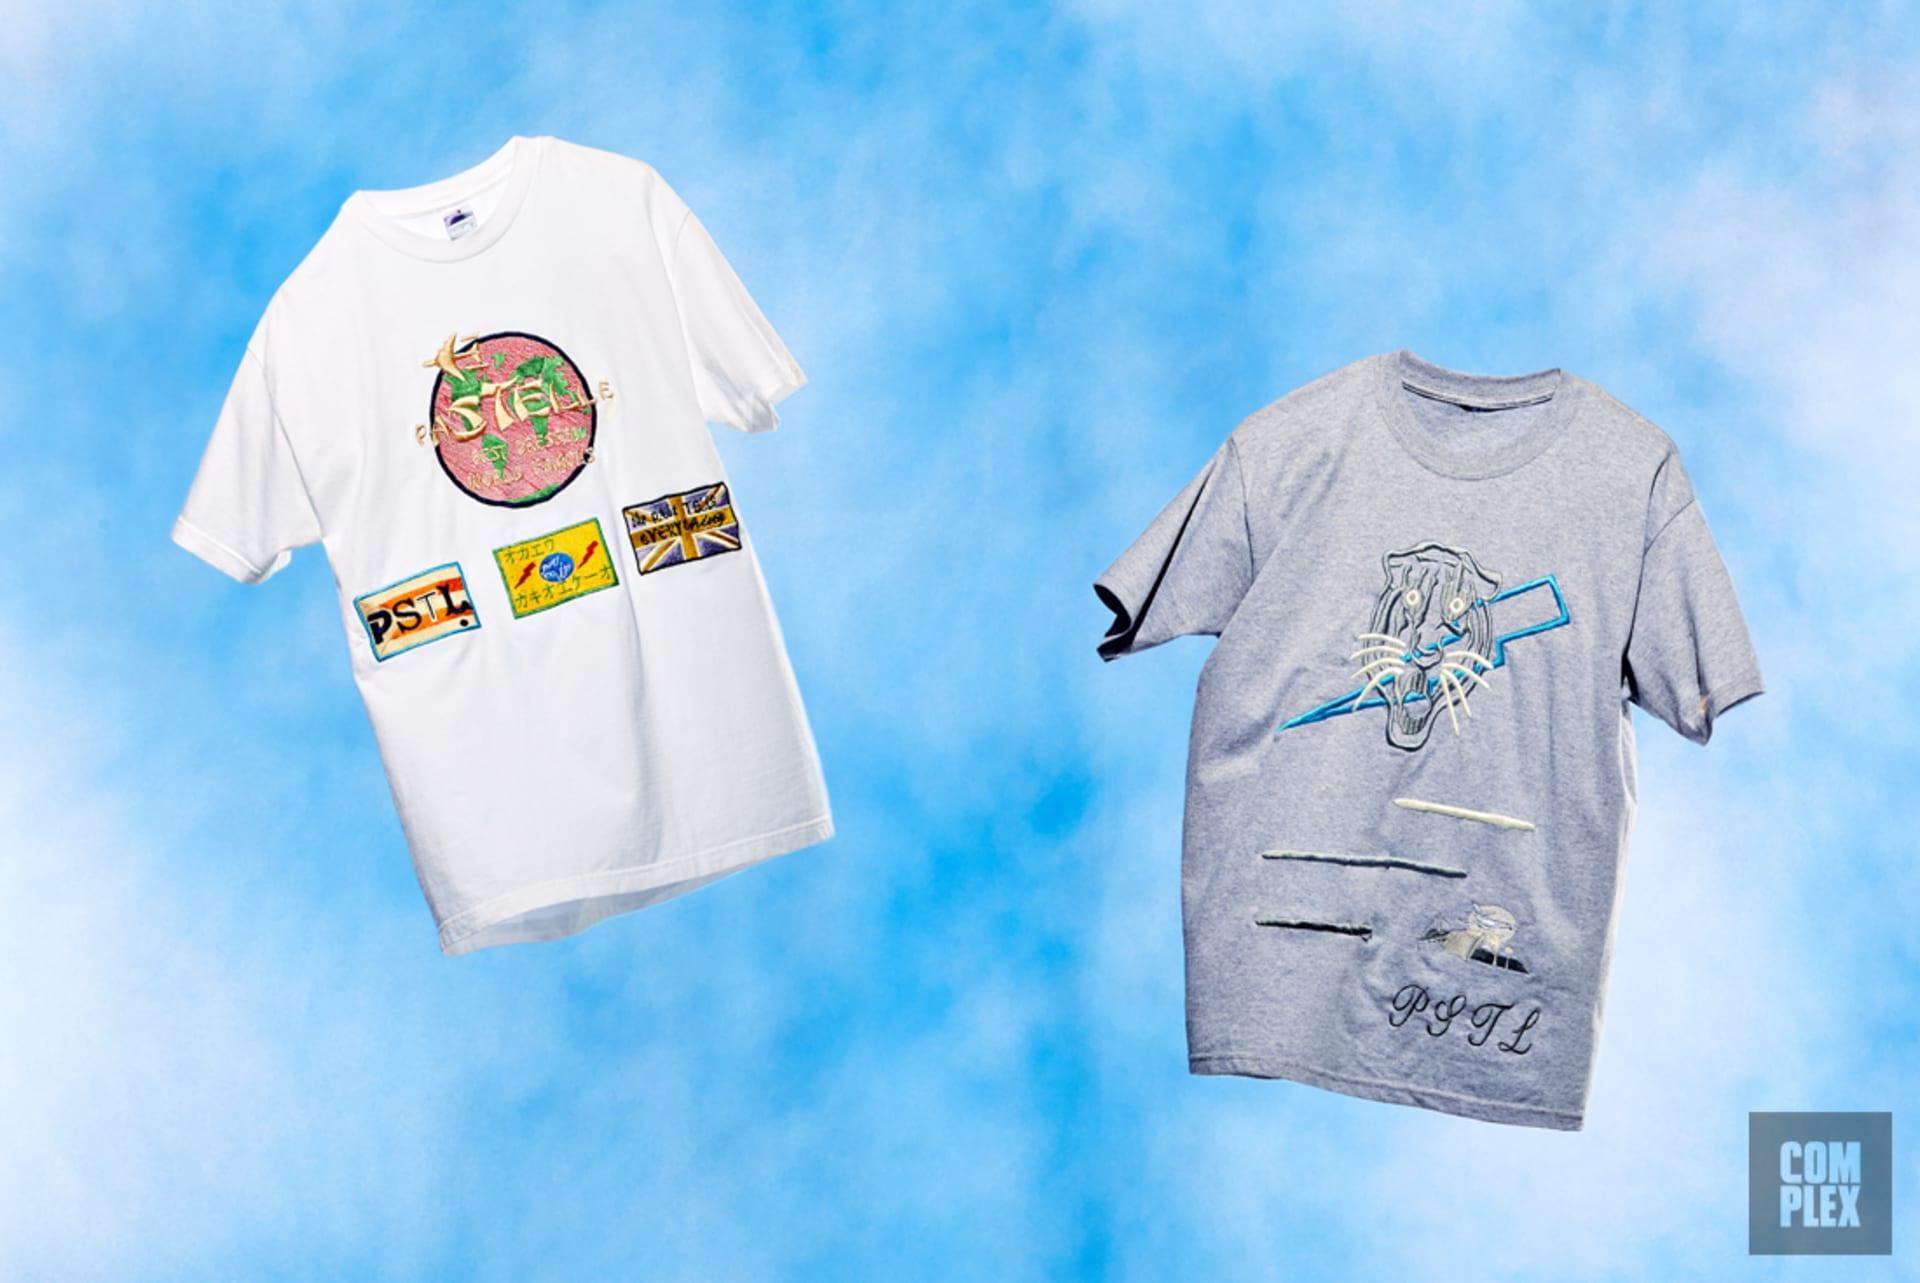 best website b4d8d e5b12 Samples of Pastelle graphic T-shirts